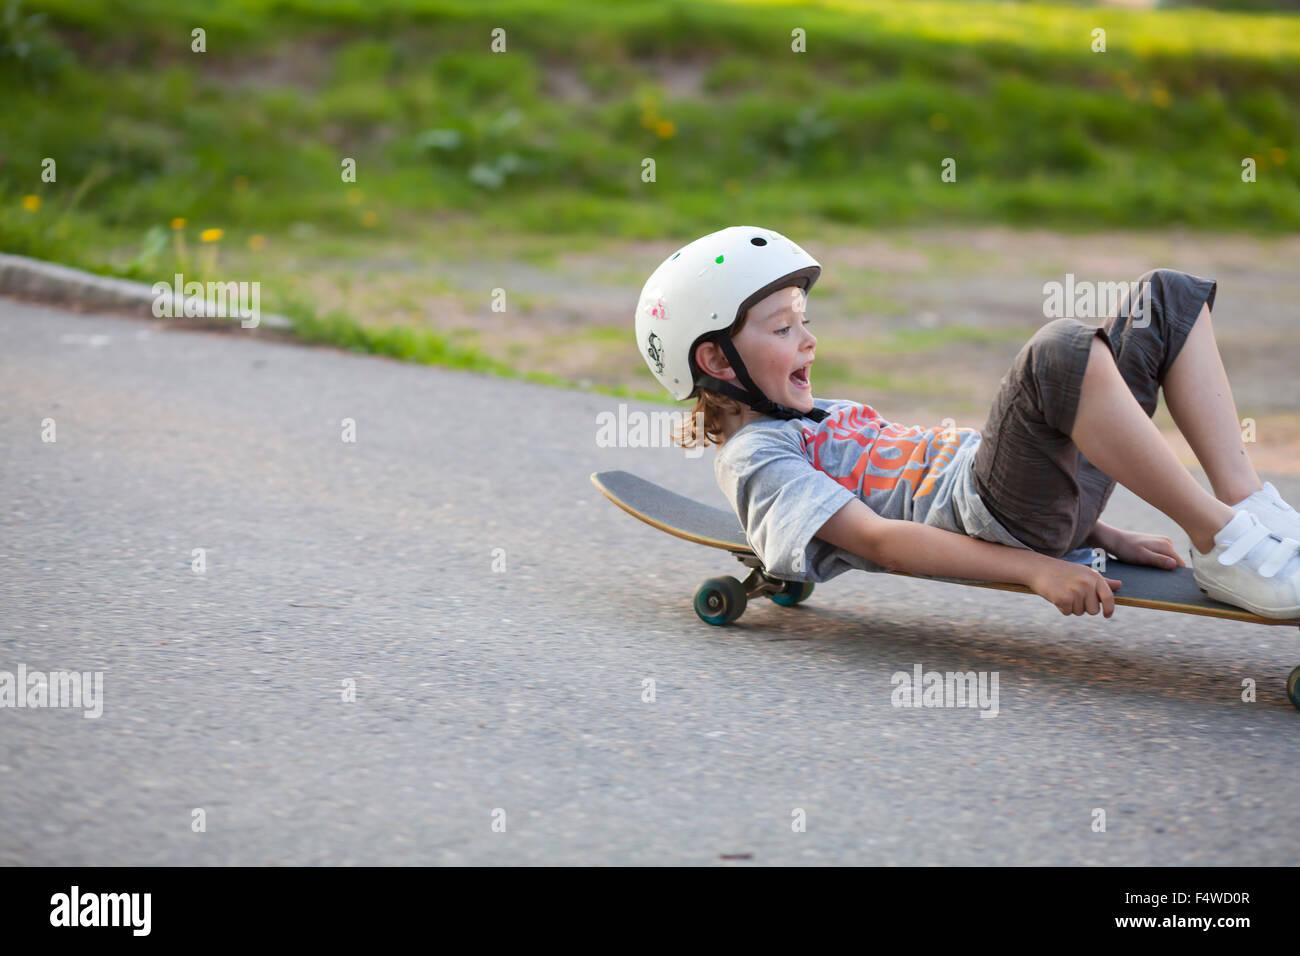 Sweden, Vastergotland, Lerum, Boy (8-9) sliding down street on skateboard - Stock Image